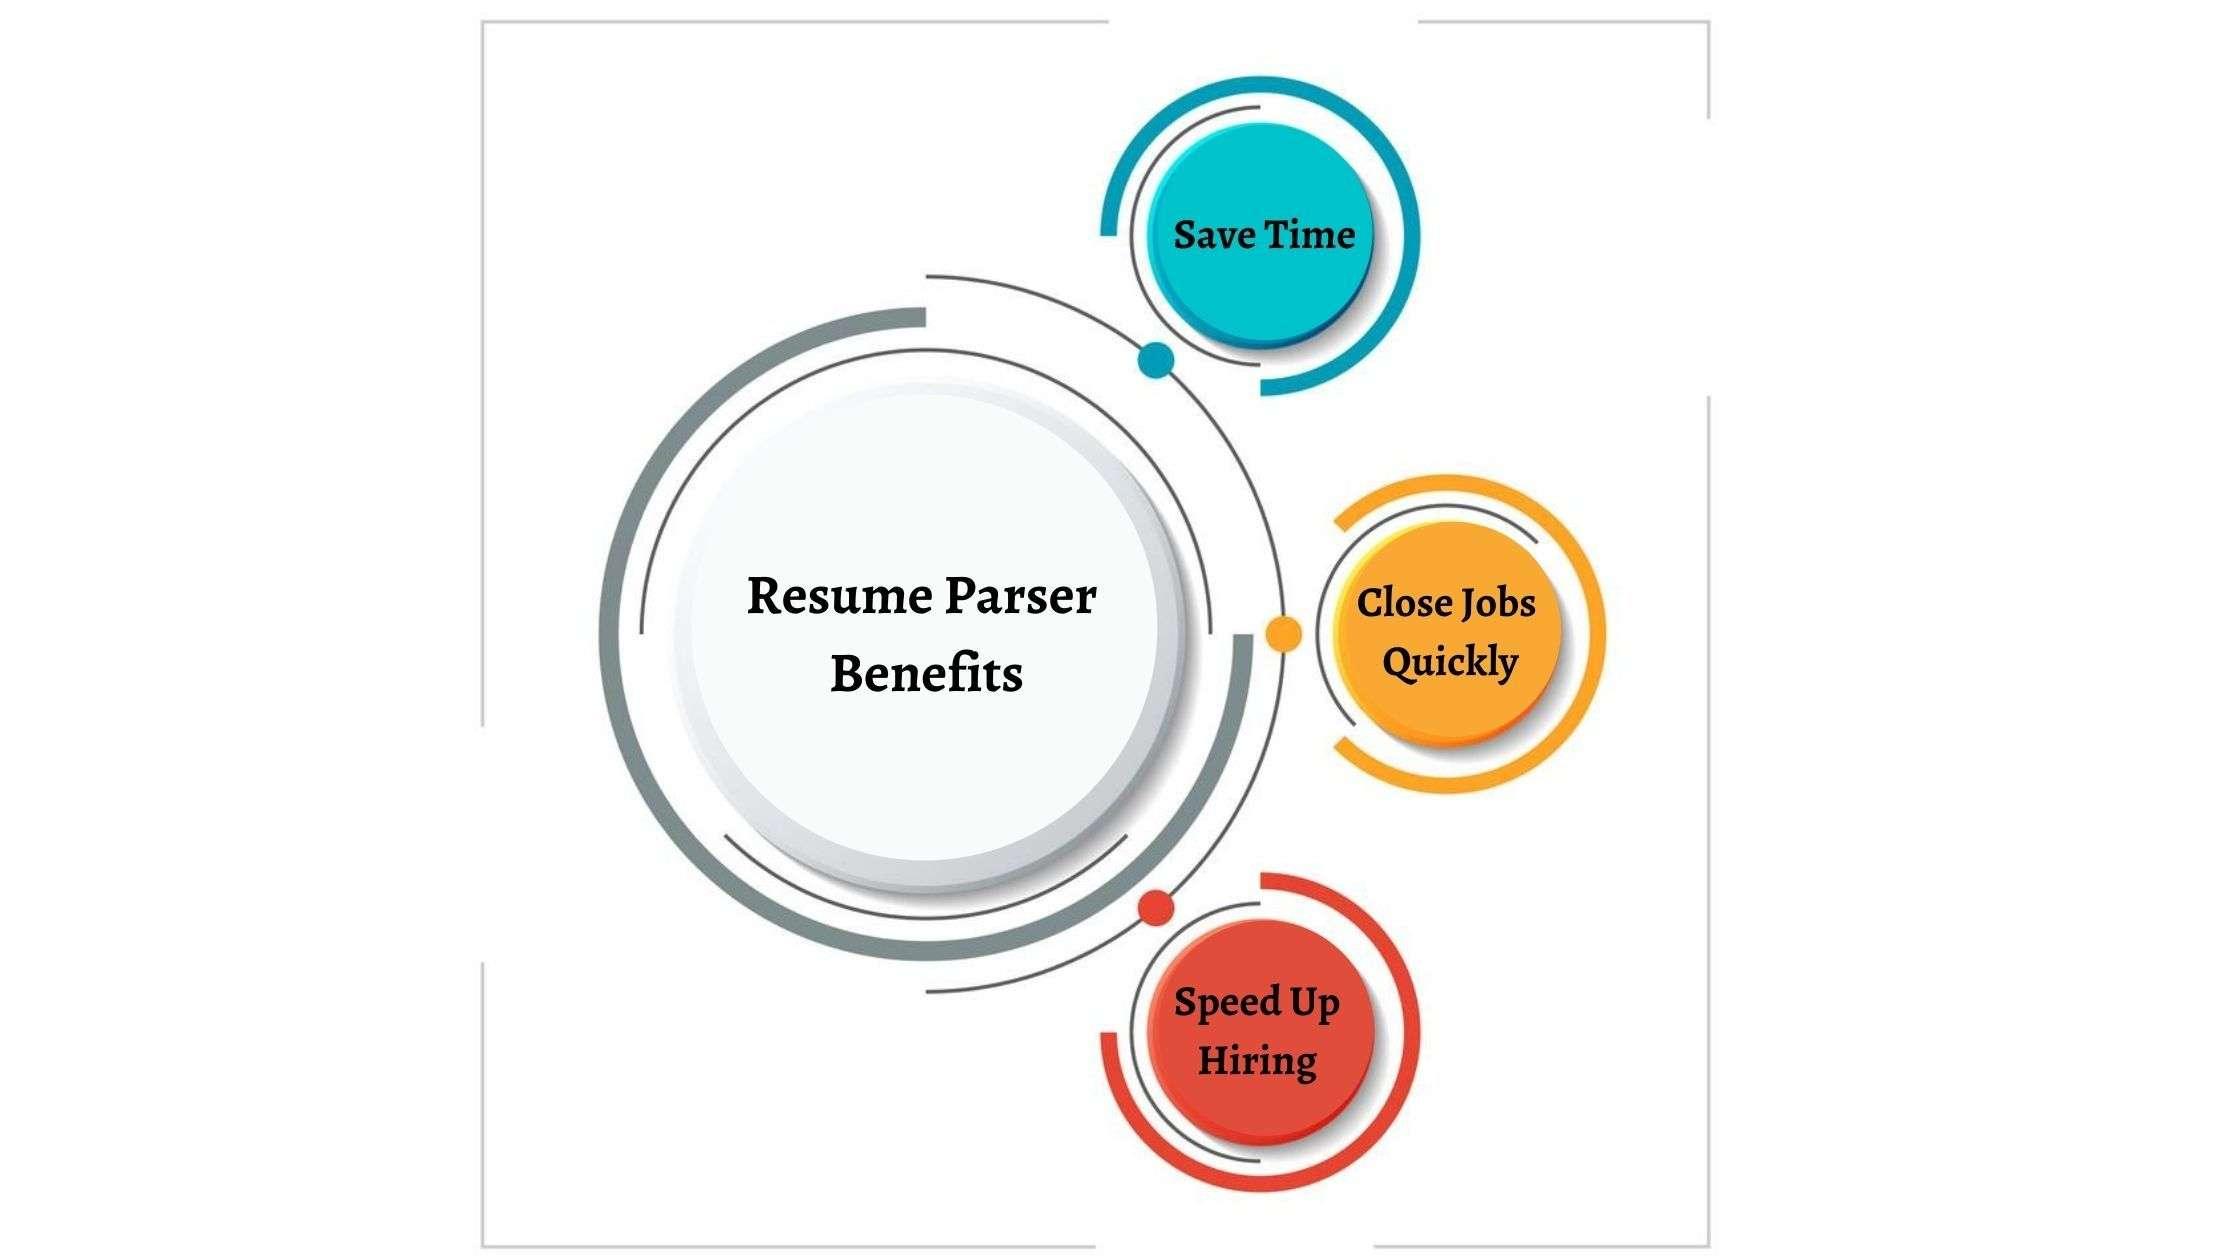 Resume Parser Benefits